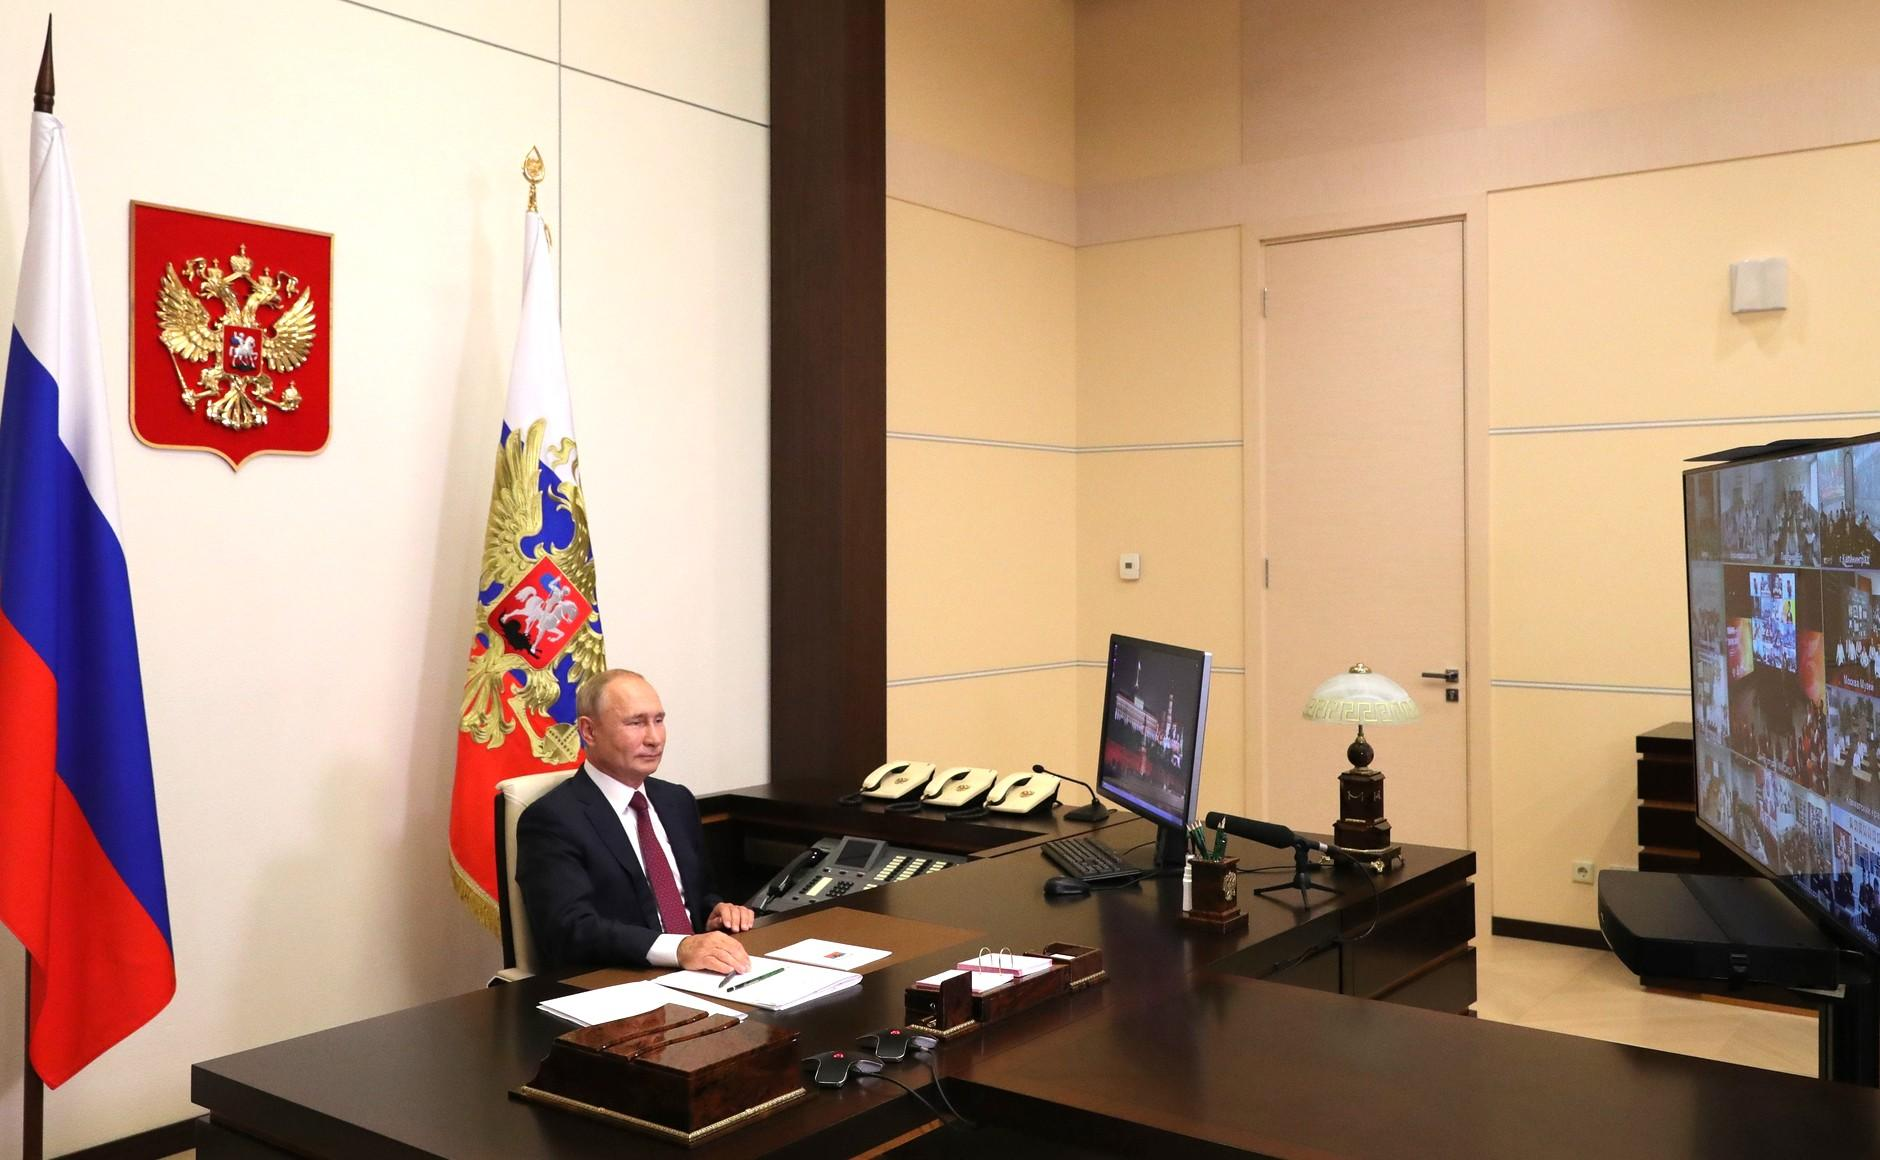 "<p>Фото © <a href=""http://kremlin.ru/events/president/news/63983/photos/64412"" target=""_blank"" rel=""noopener noreferrer"">Kremlin.ru</a></p>"